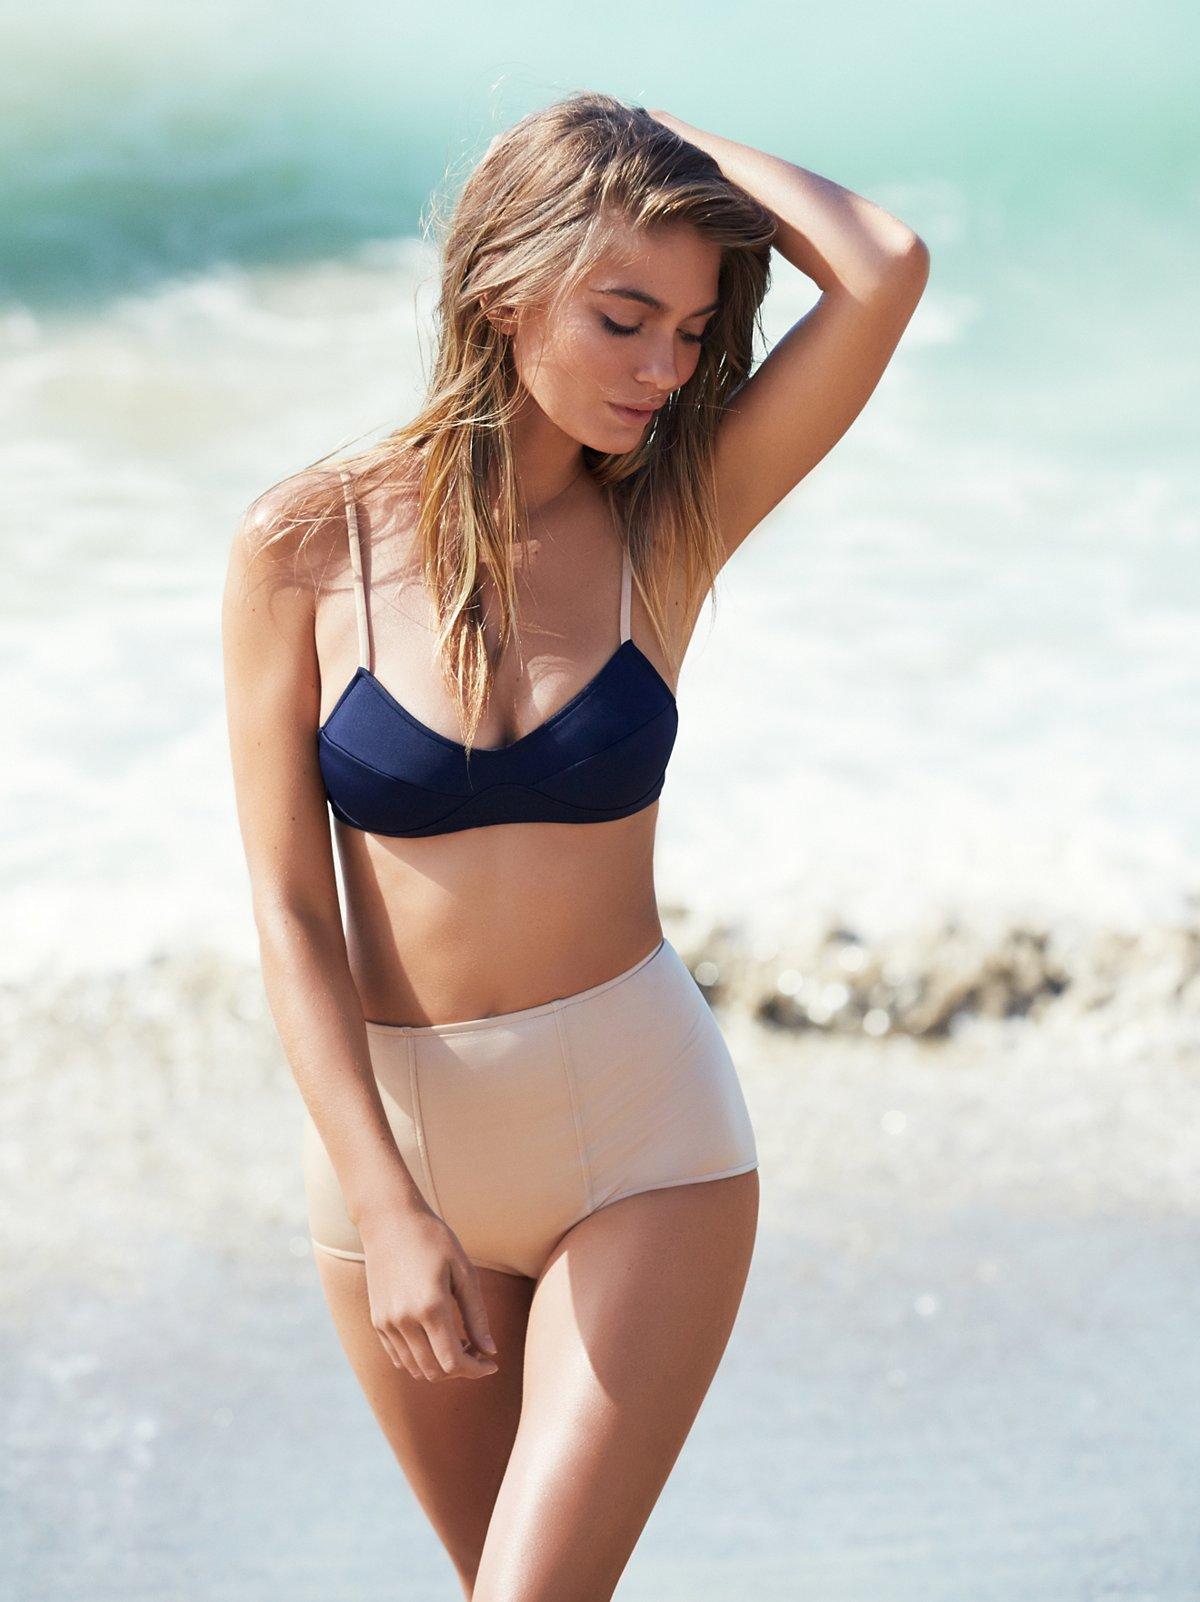 Pheonix泳裤